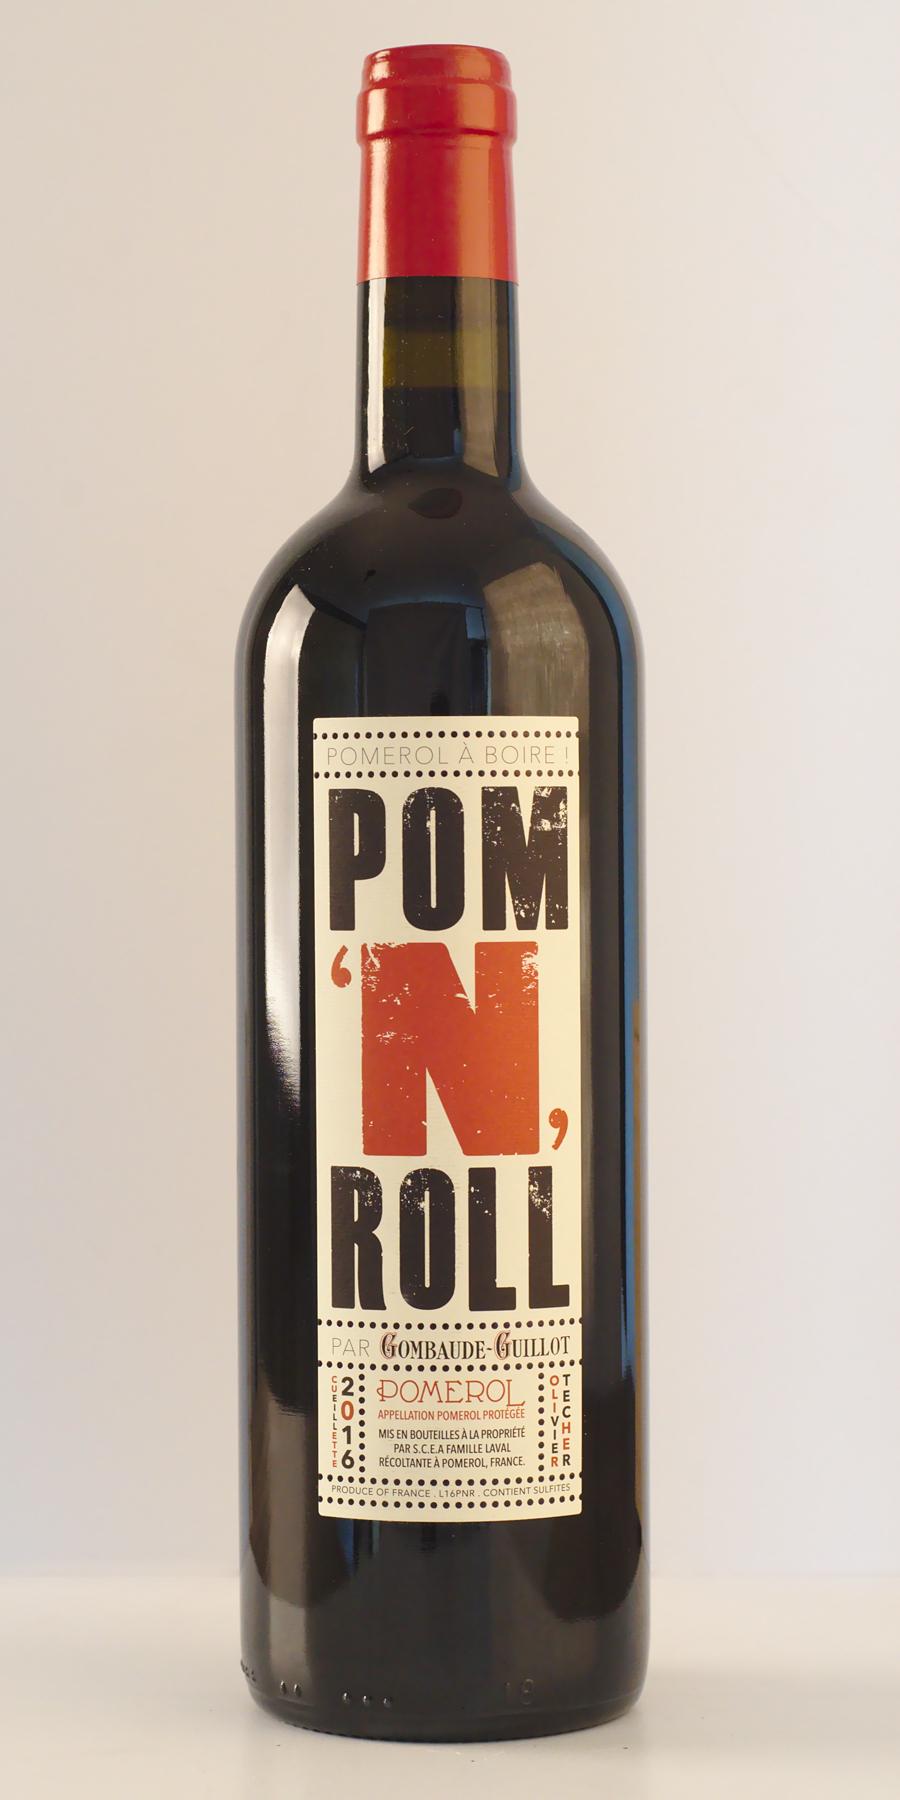 vin bio Pomerol Gombaude Guillot